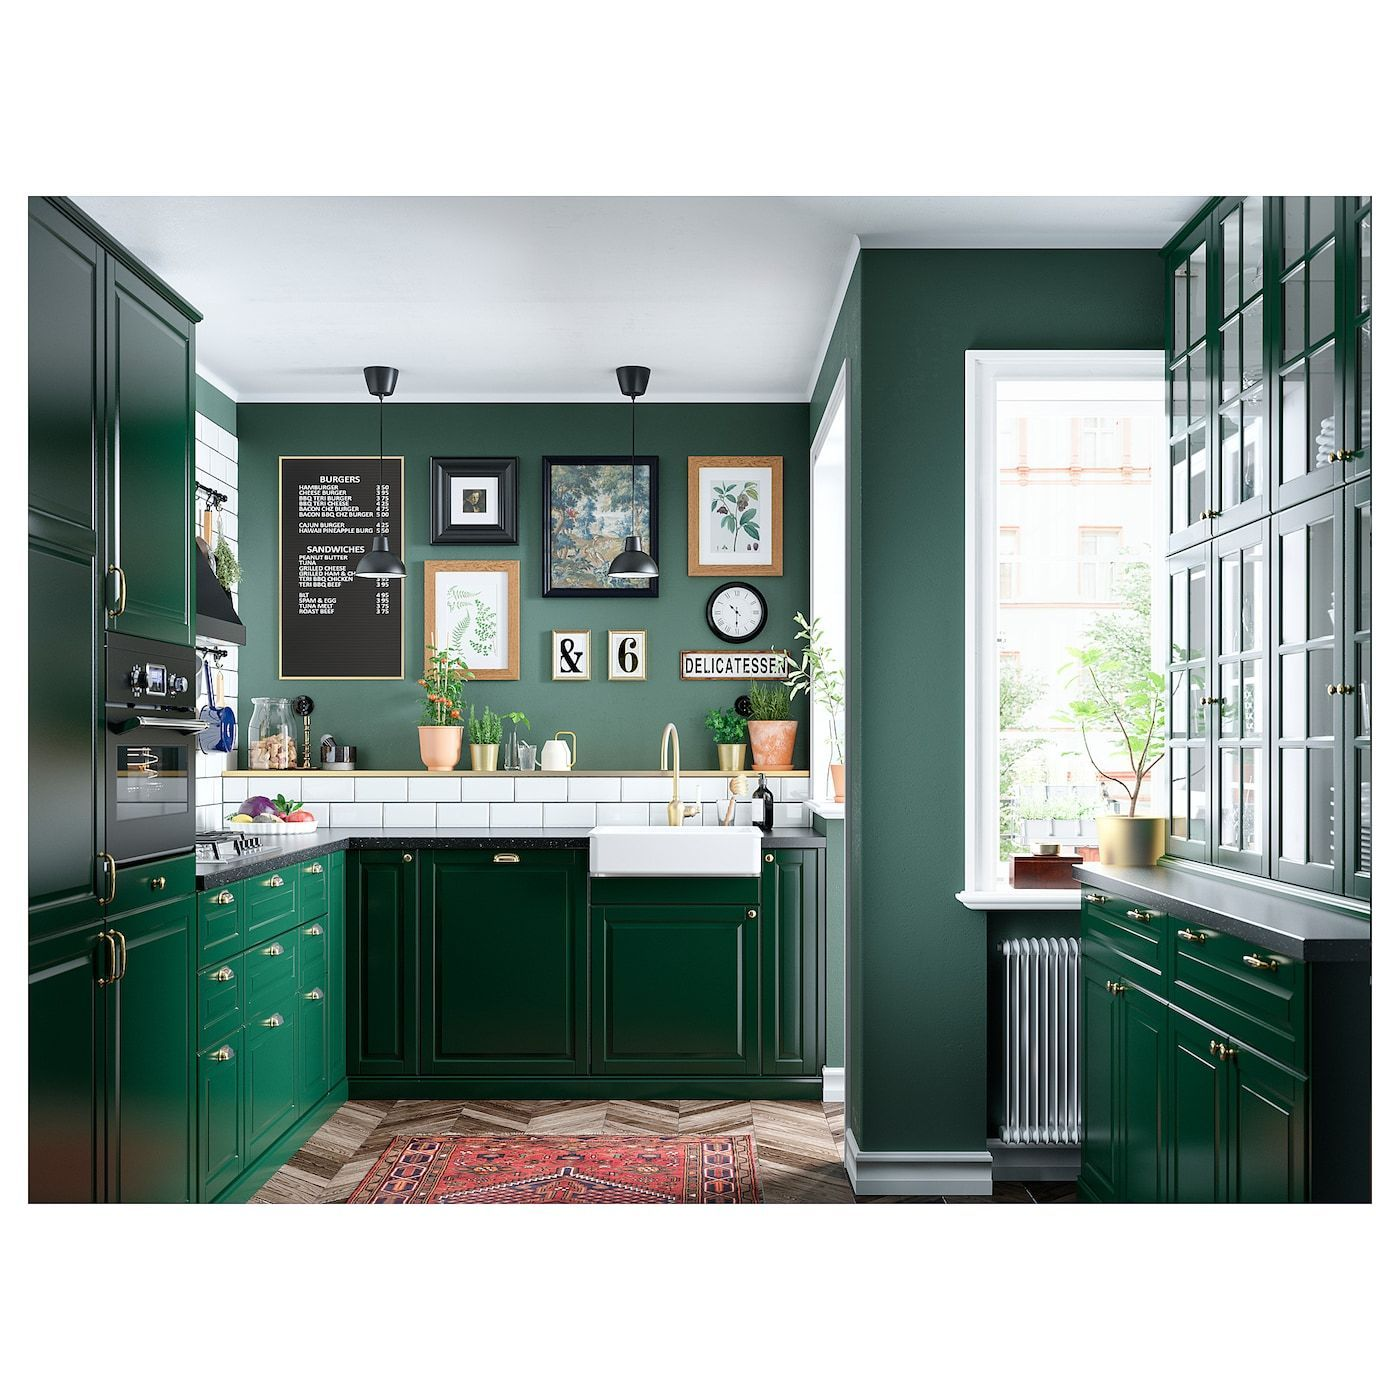 Pin By N On Wowwww In 2021 Ikea Bodbyn Kitchen Dark Green Kitchen Green Kitchen Cabinets